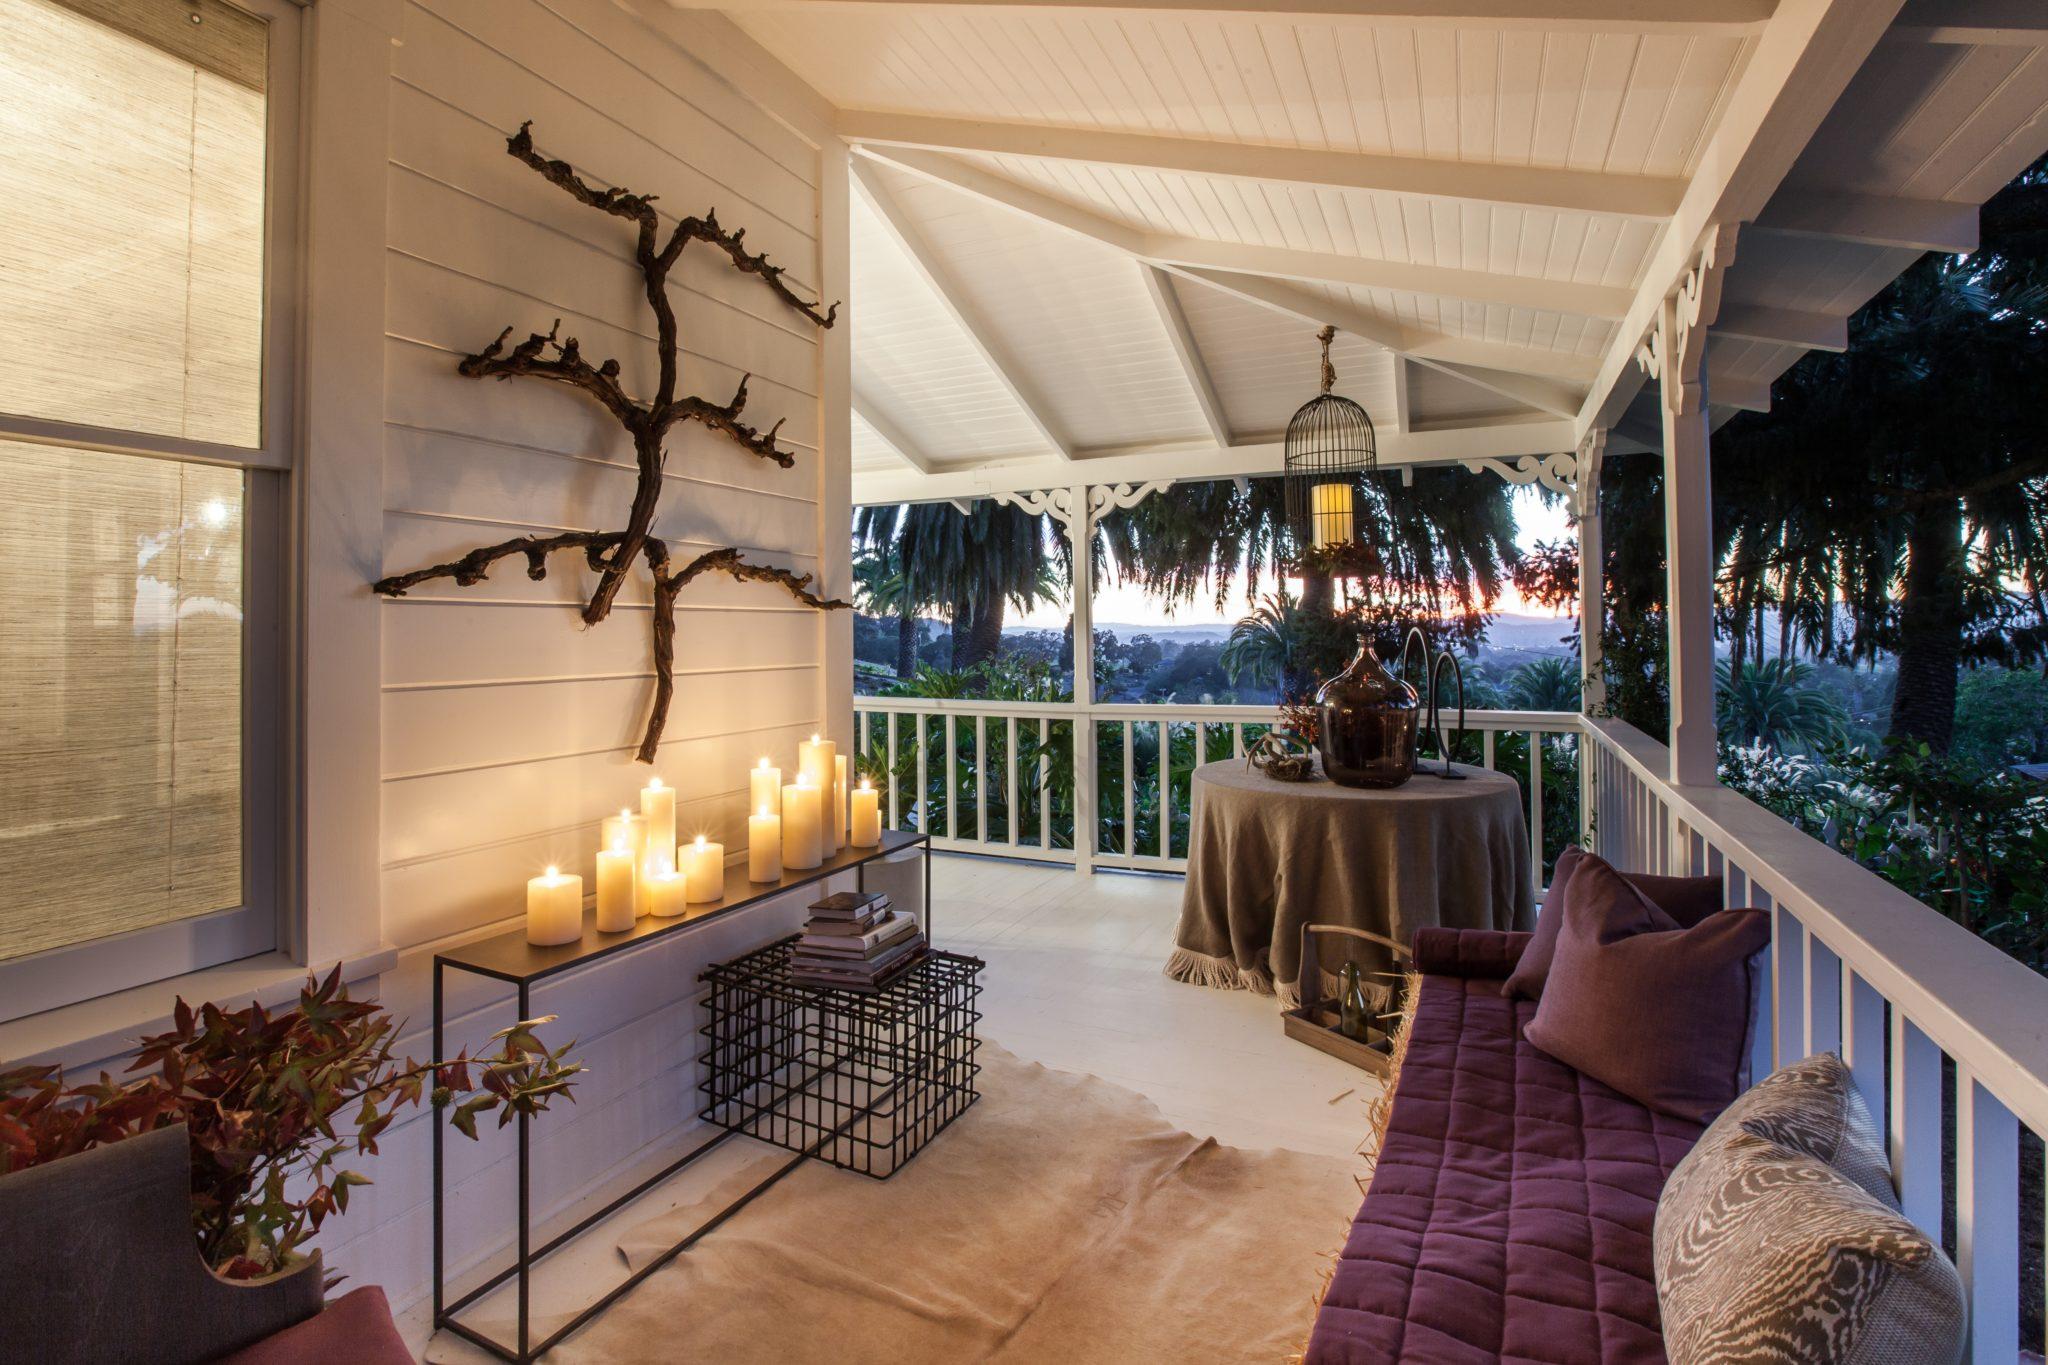 Napa Victorian farmhouse porch sunset view by Miyuki Yamaguchi Design Studio